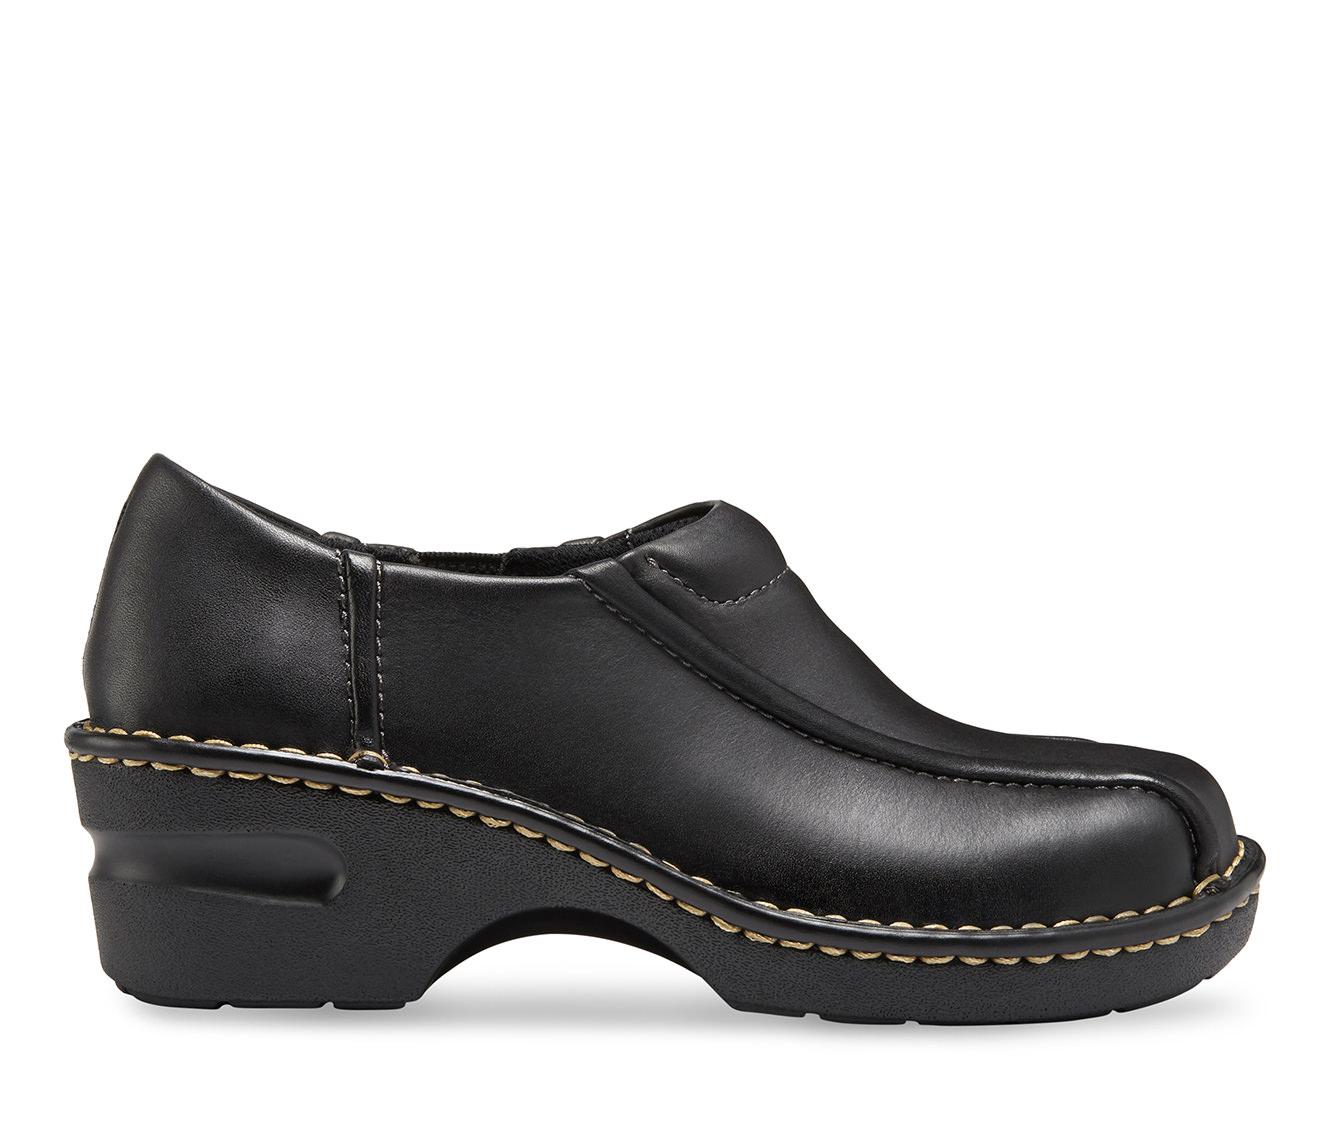 Eastland Tracie Women's Shoe (Black Leather)